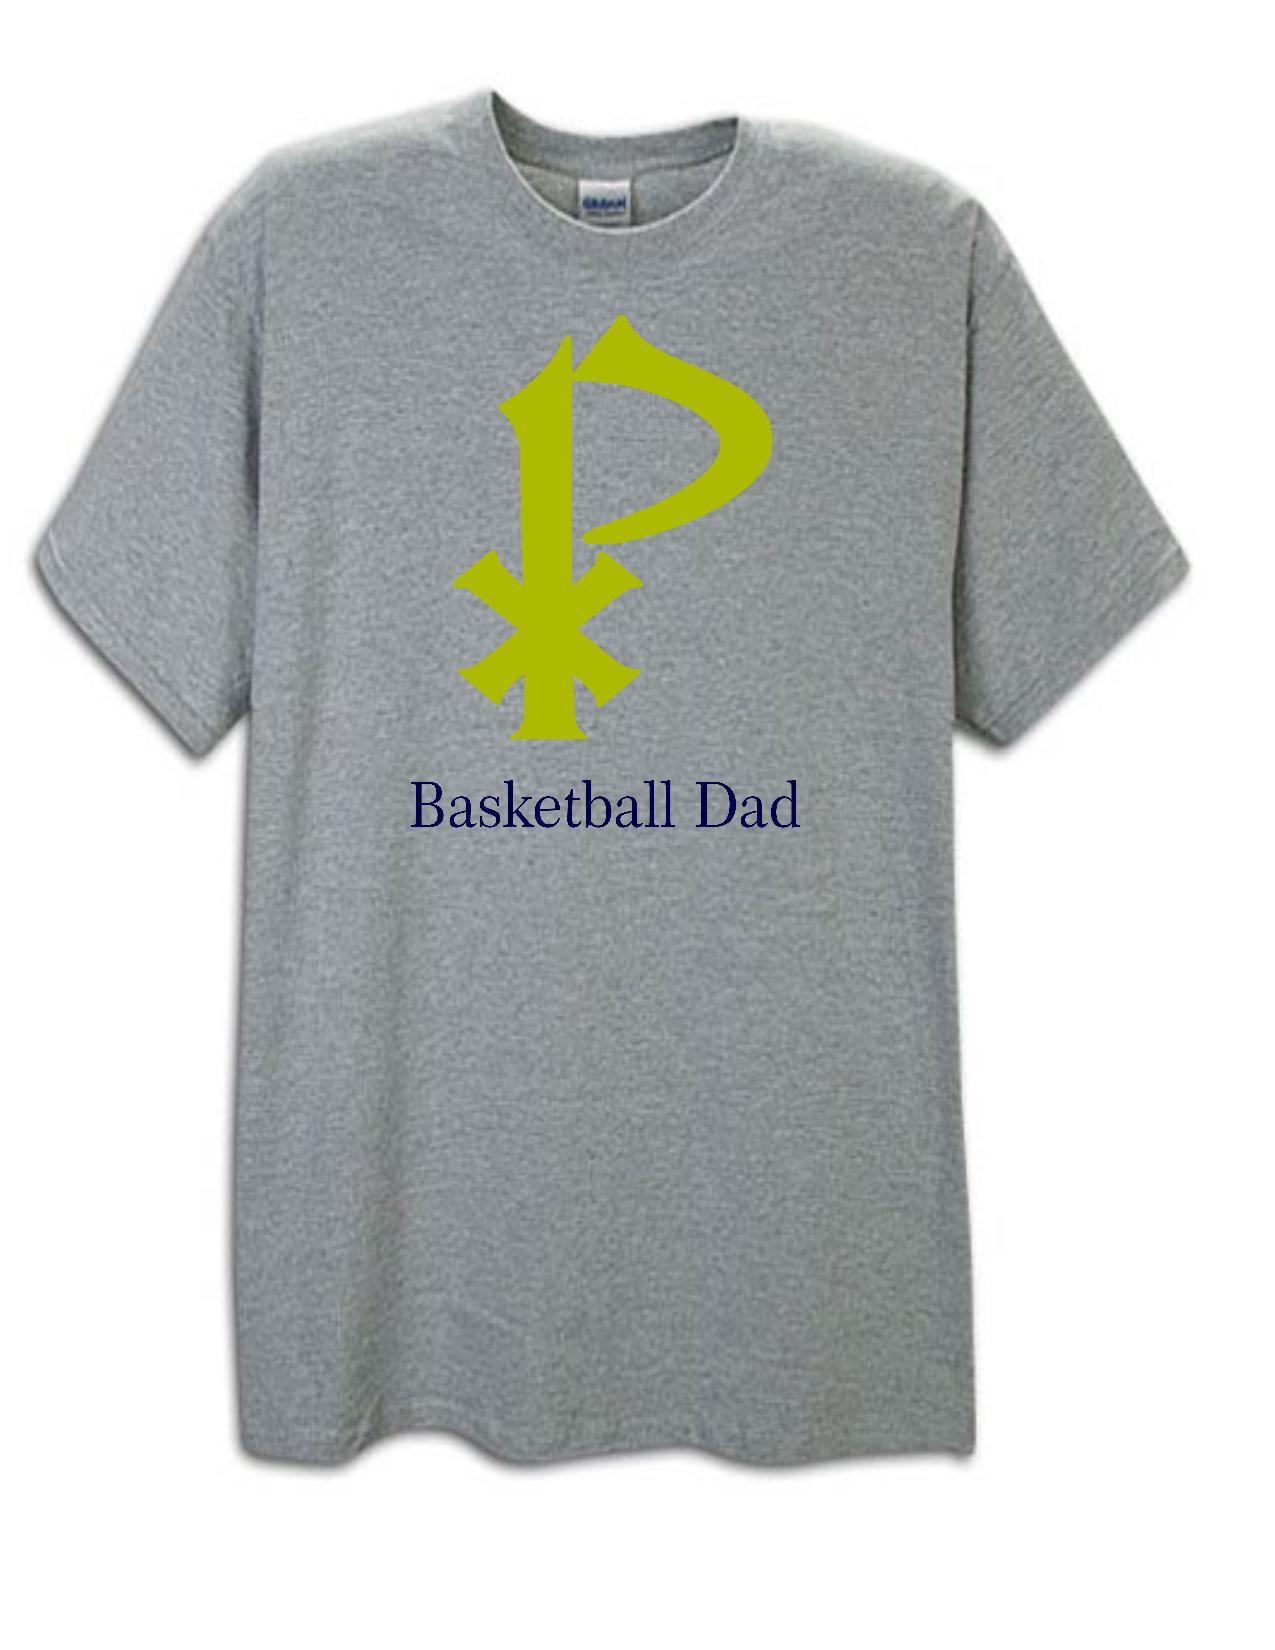 St. Pius Basketball Dad Tee